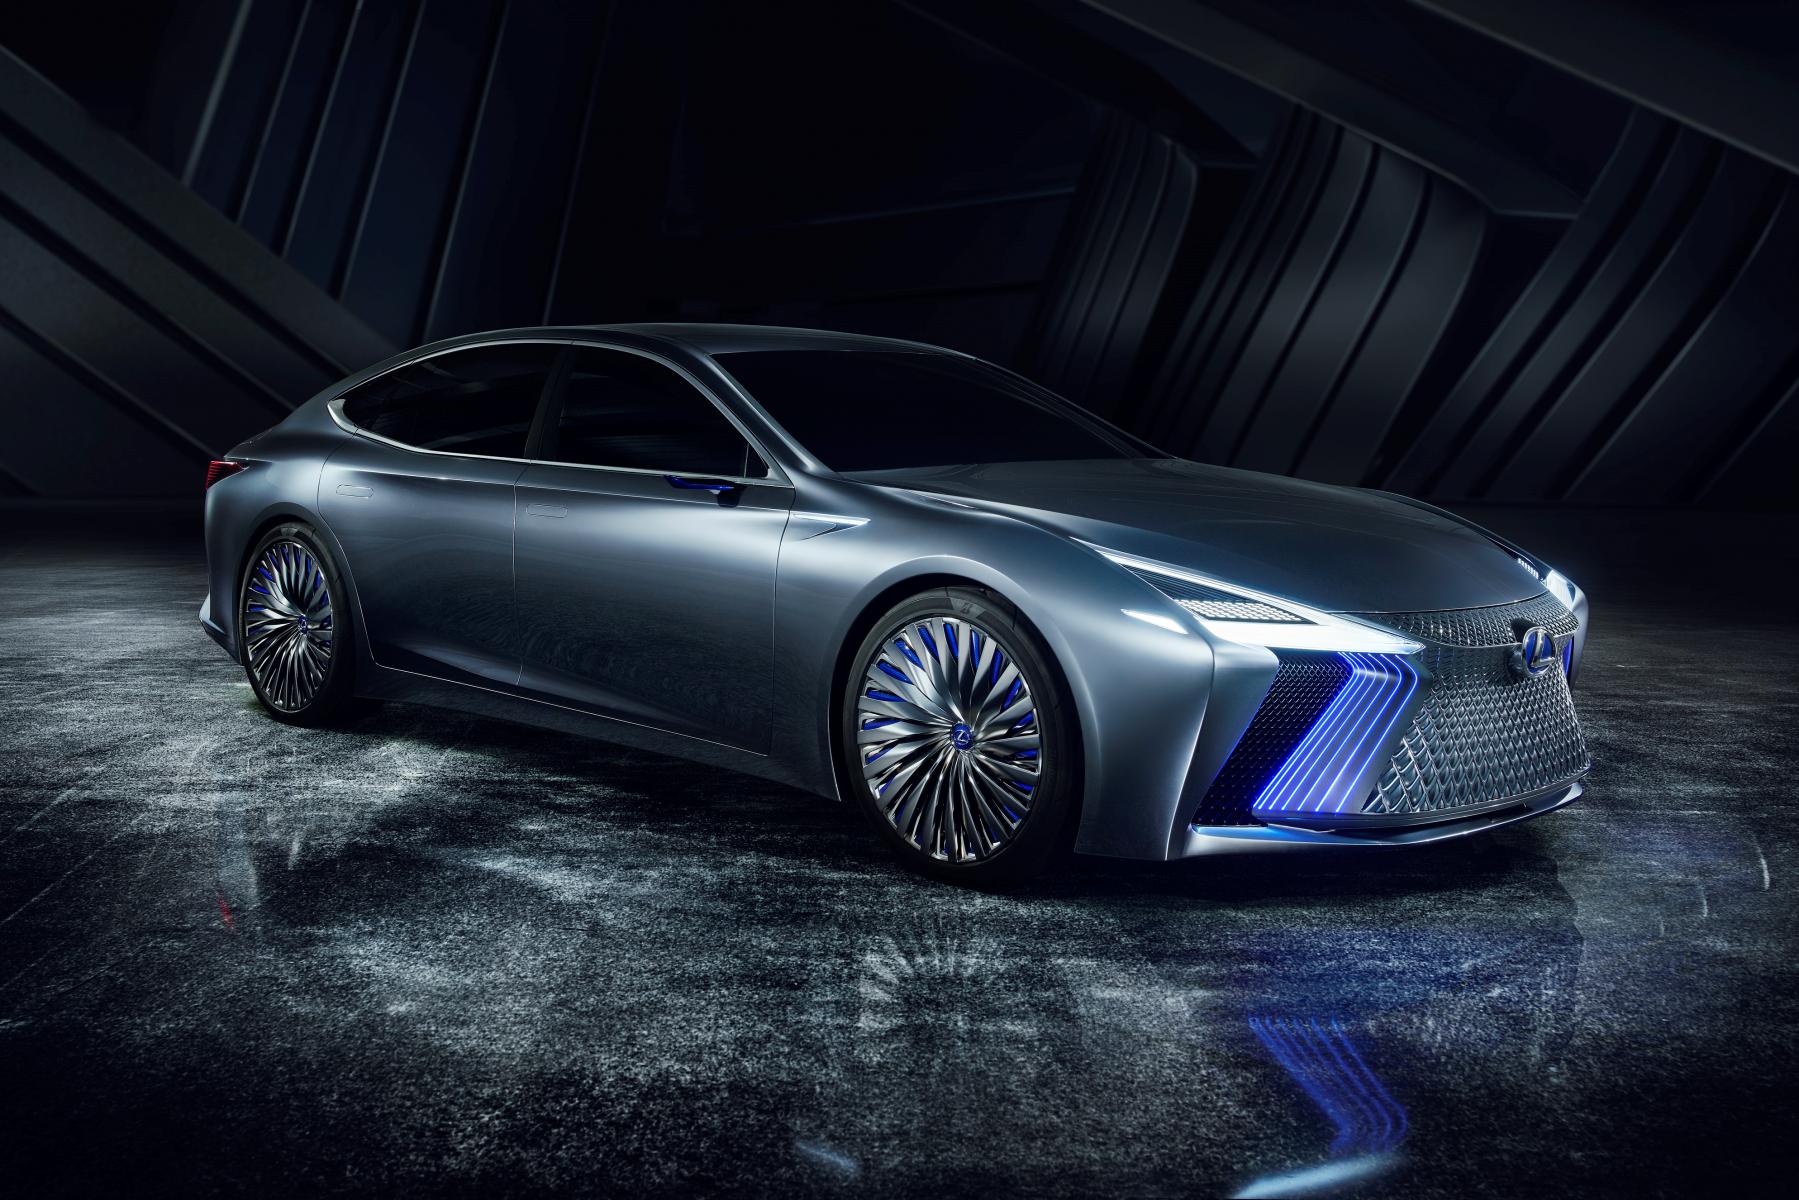 58 New Lexus 2020 Es New Concept Engine with Lexus 2020 Es New Concept